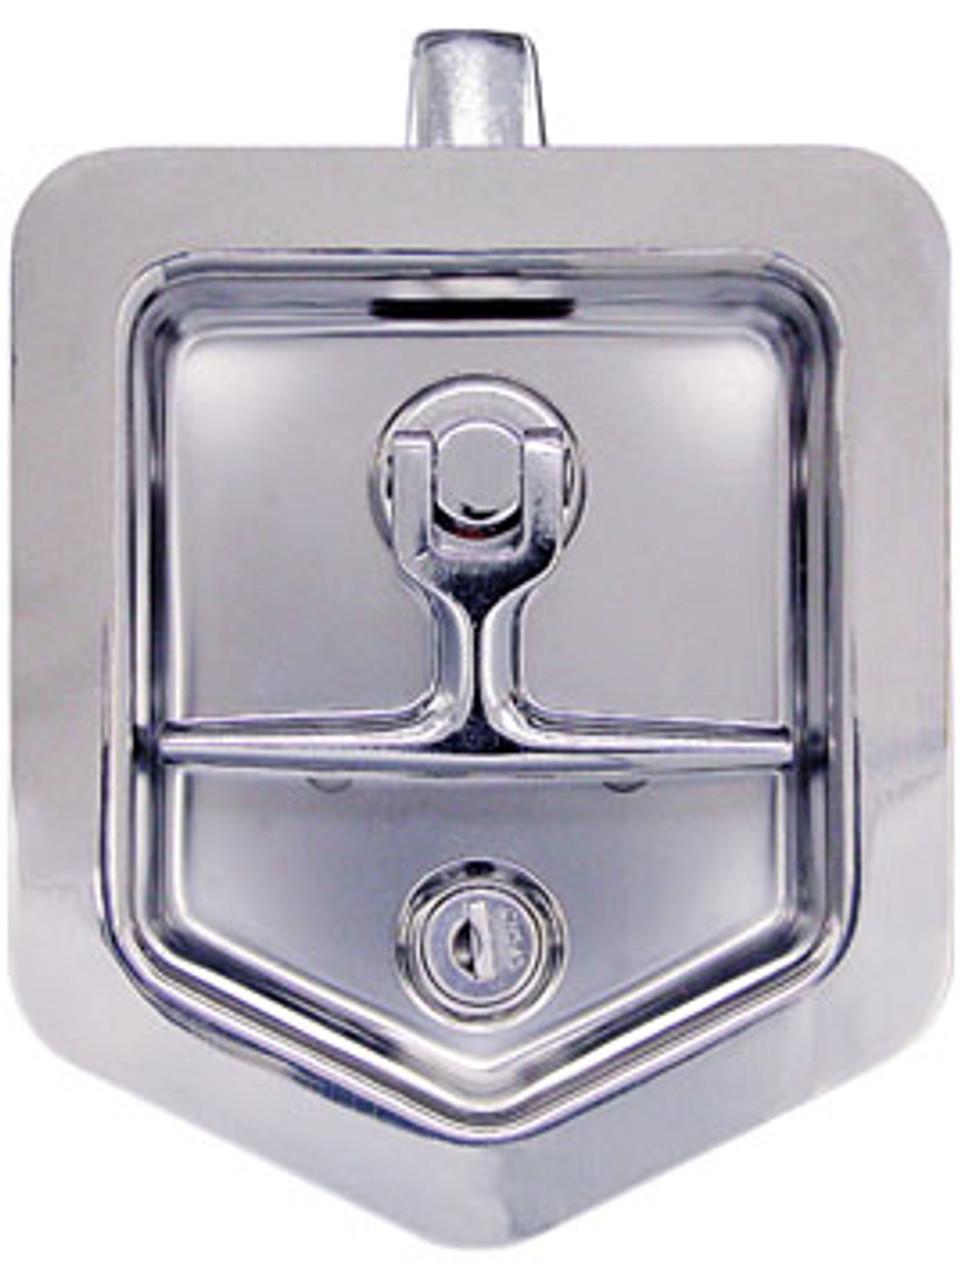 L8816 --- Paddle Latch, Flush Mount T-Handle, Locking